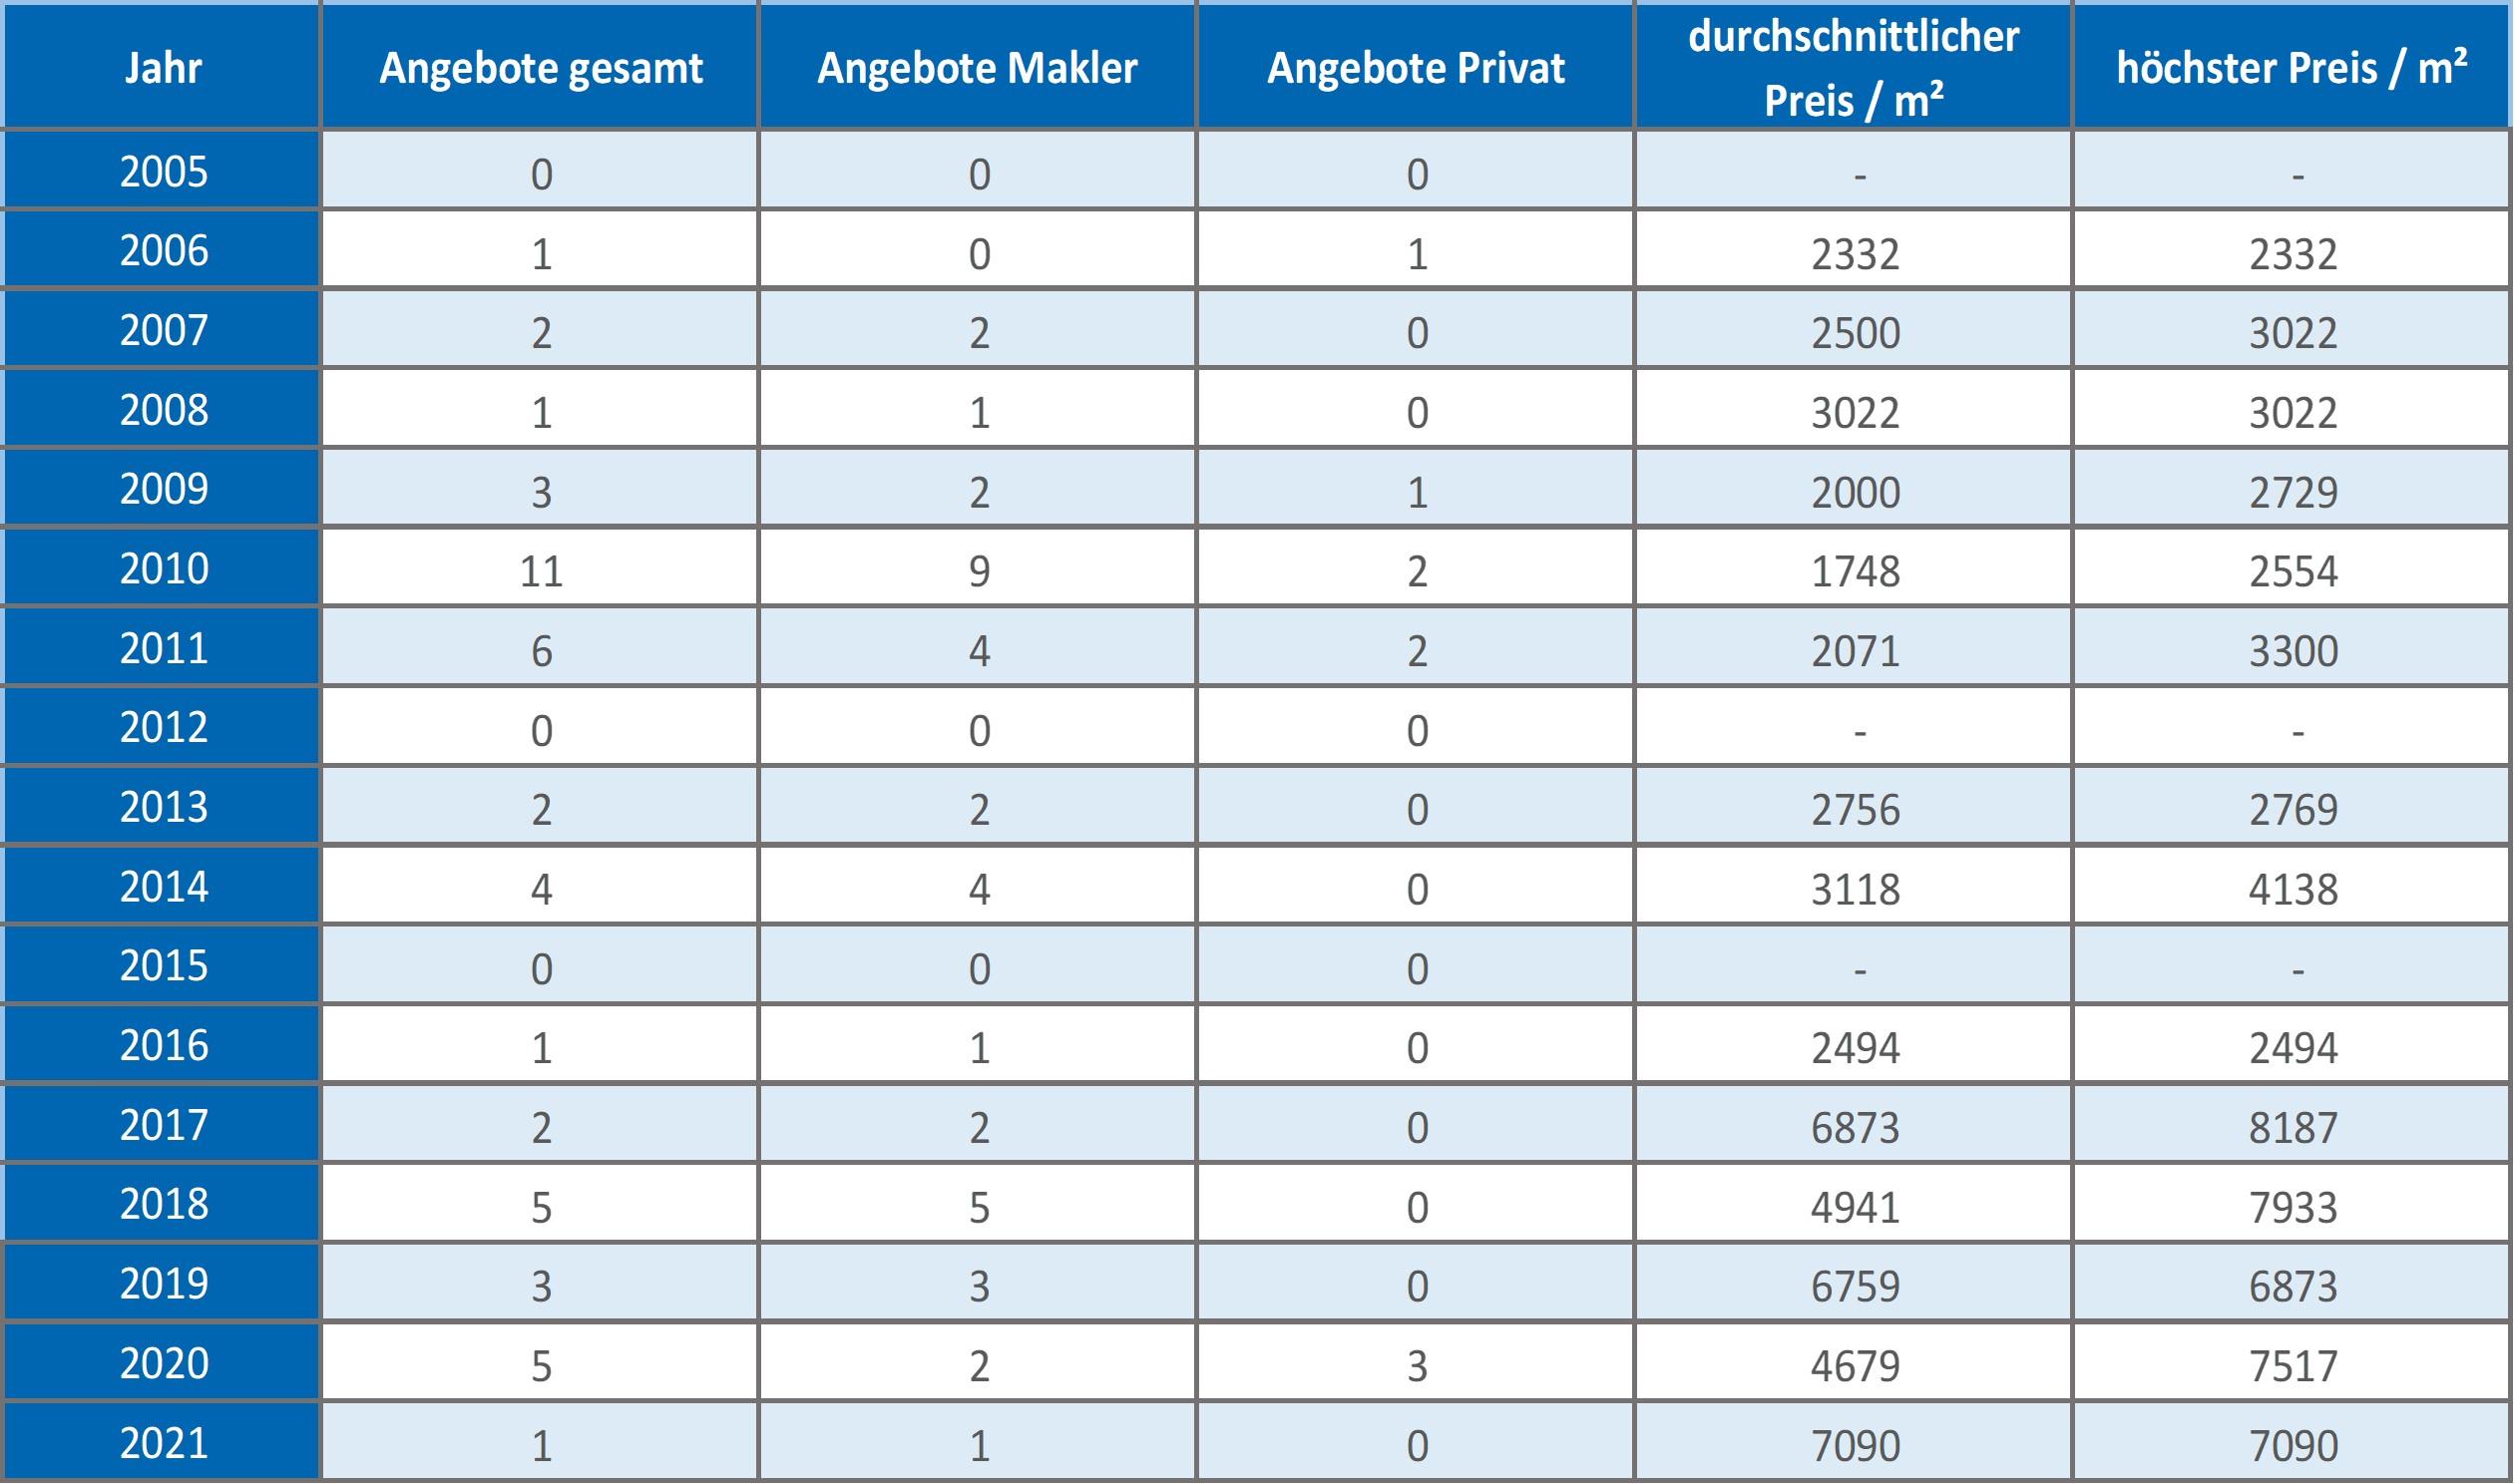 Aying-Mehrfamilienhaus-kaufen-verkaufen-Makler 2019, 2020, 2021